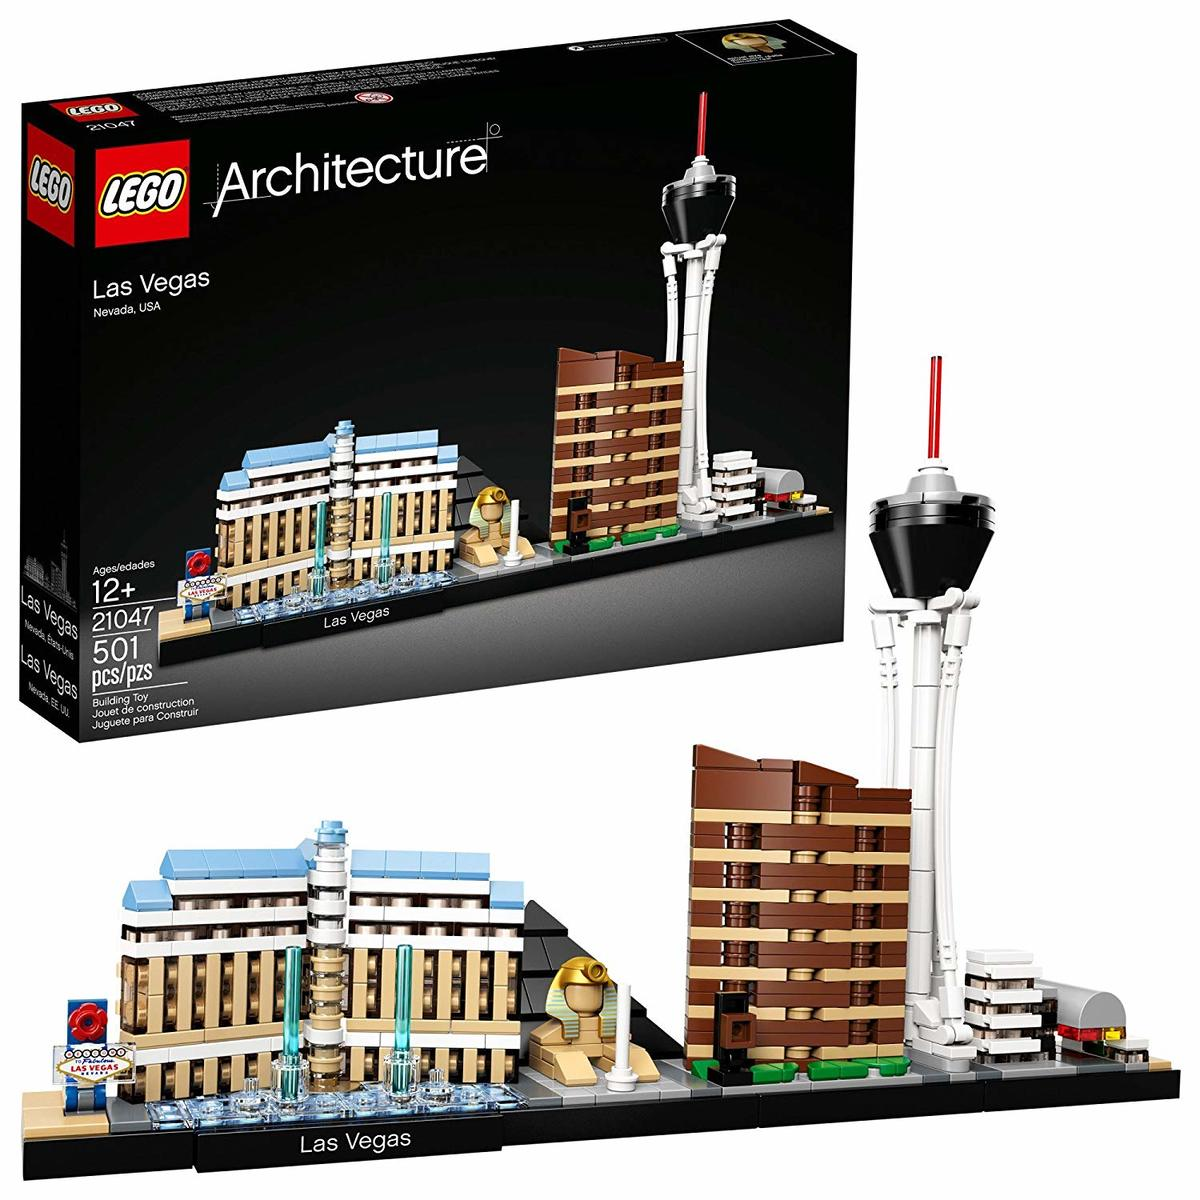 LEGO - 21047 Las Vegas skyline